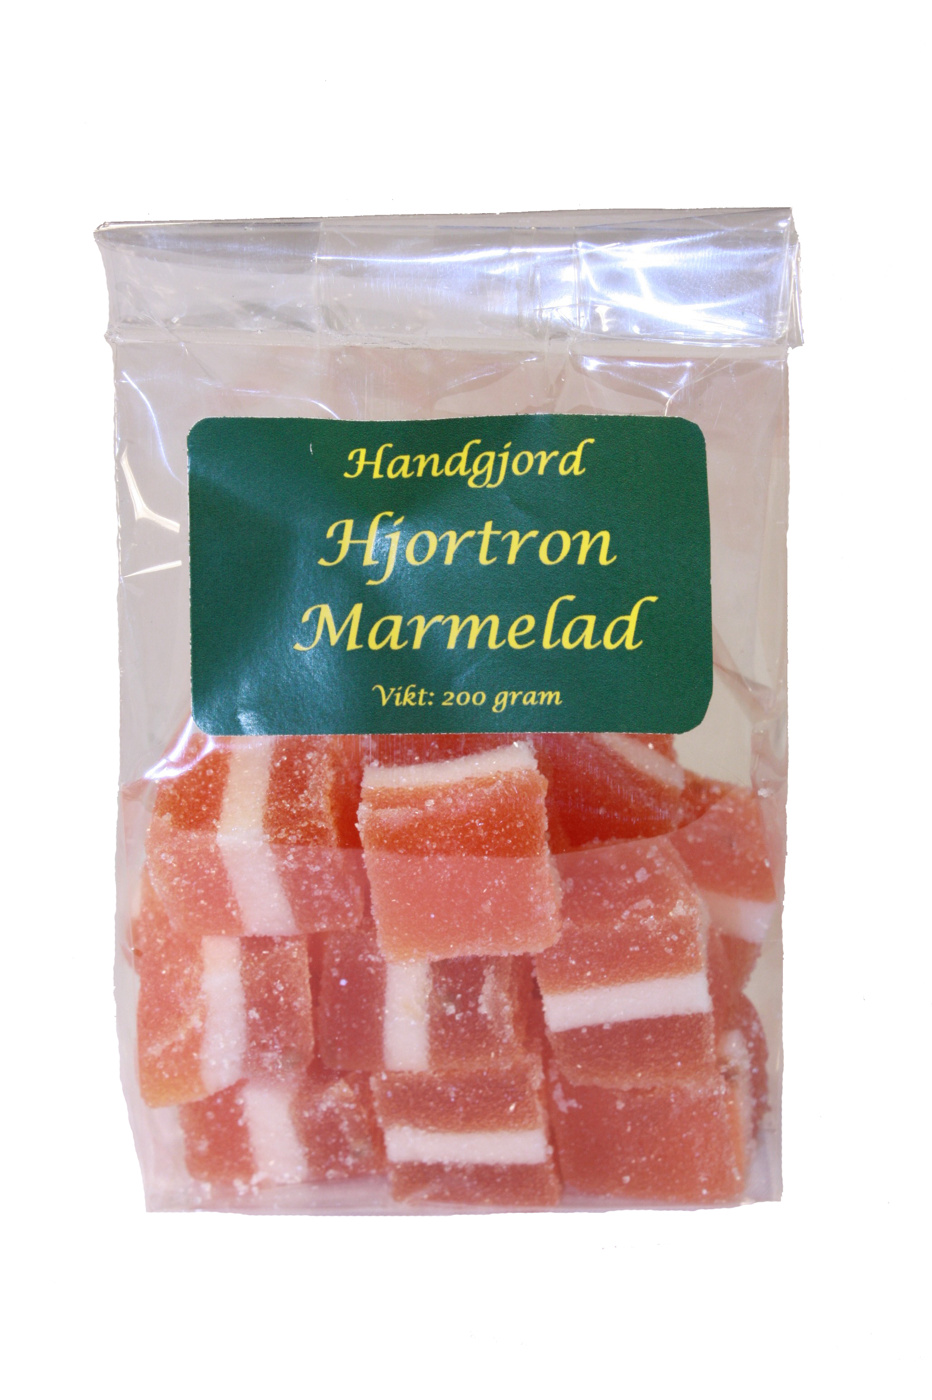 Marmelad Hjortron